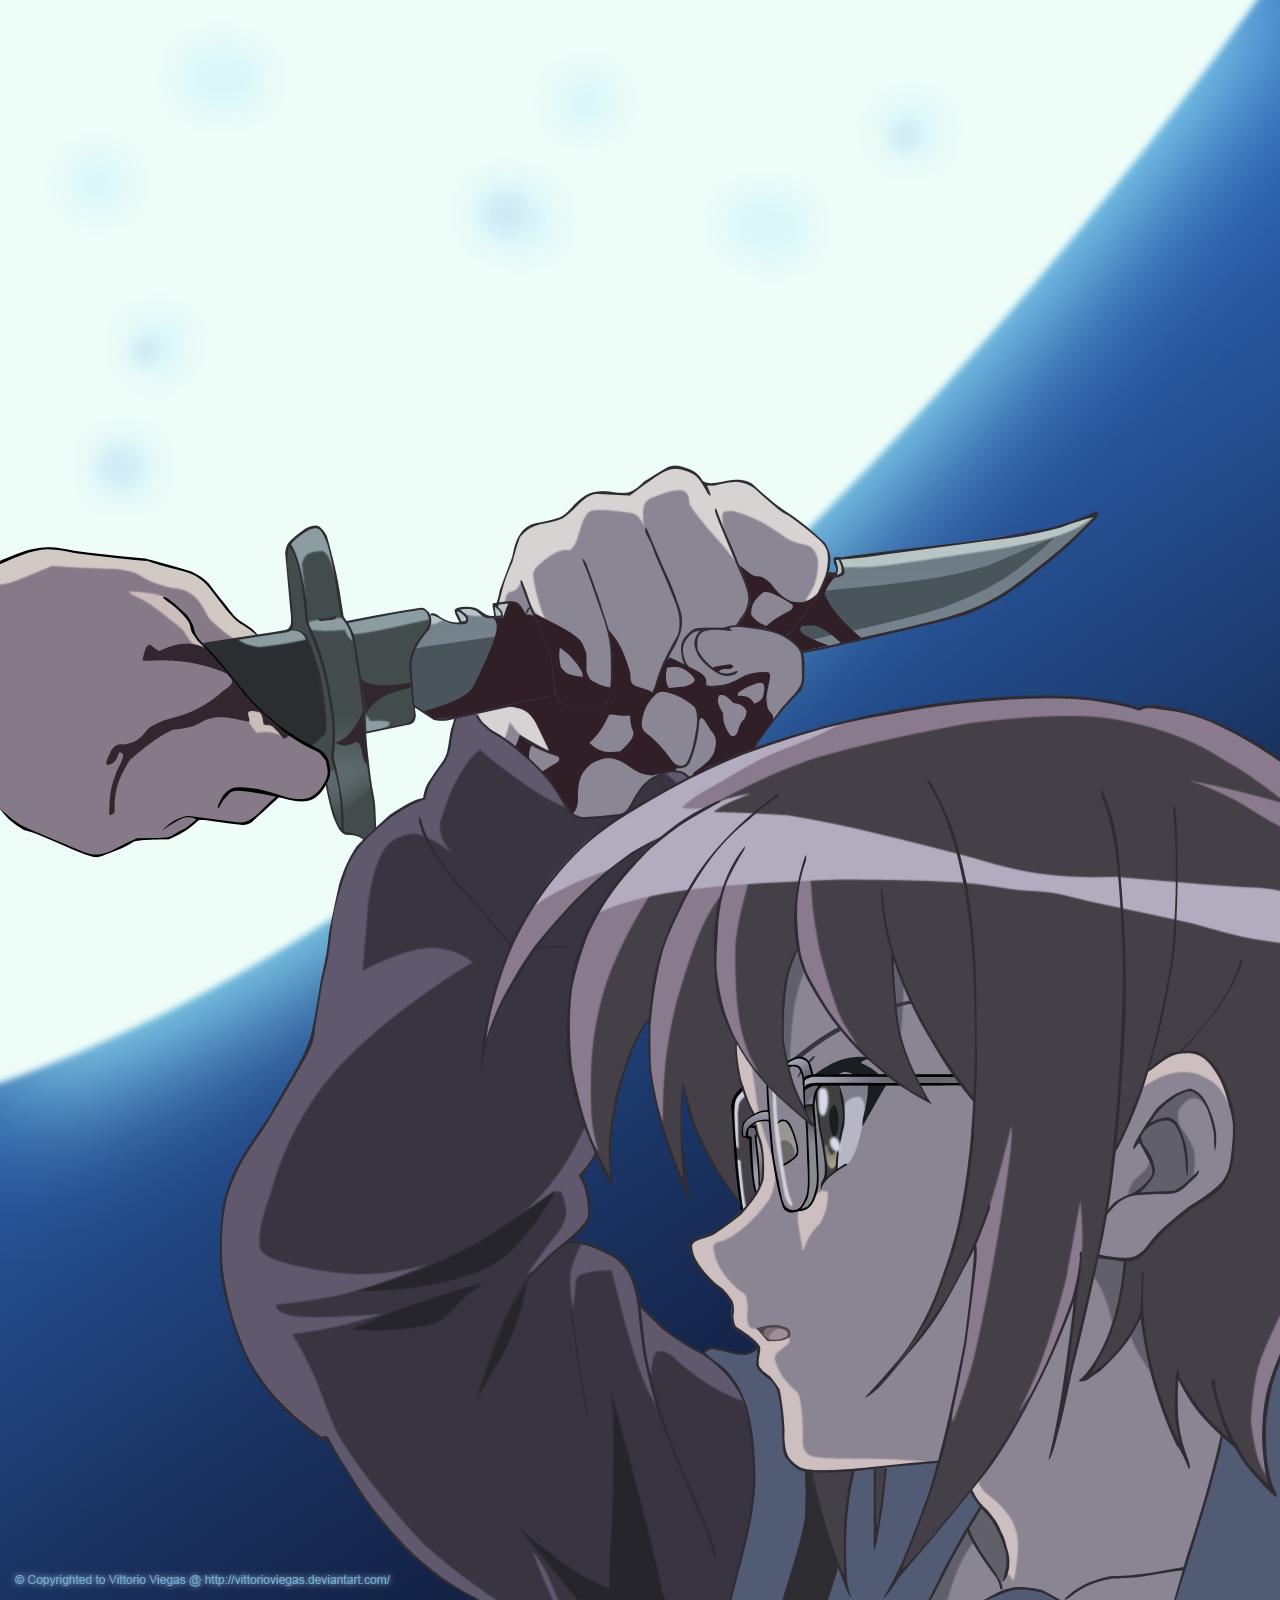 The Melancholy of Haruhi Suzumiya, Vol. 17 - manga